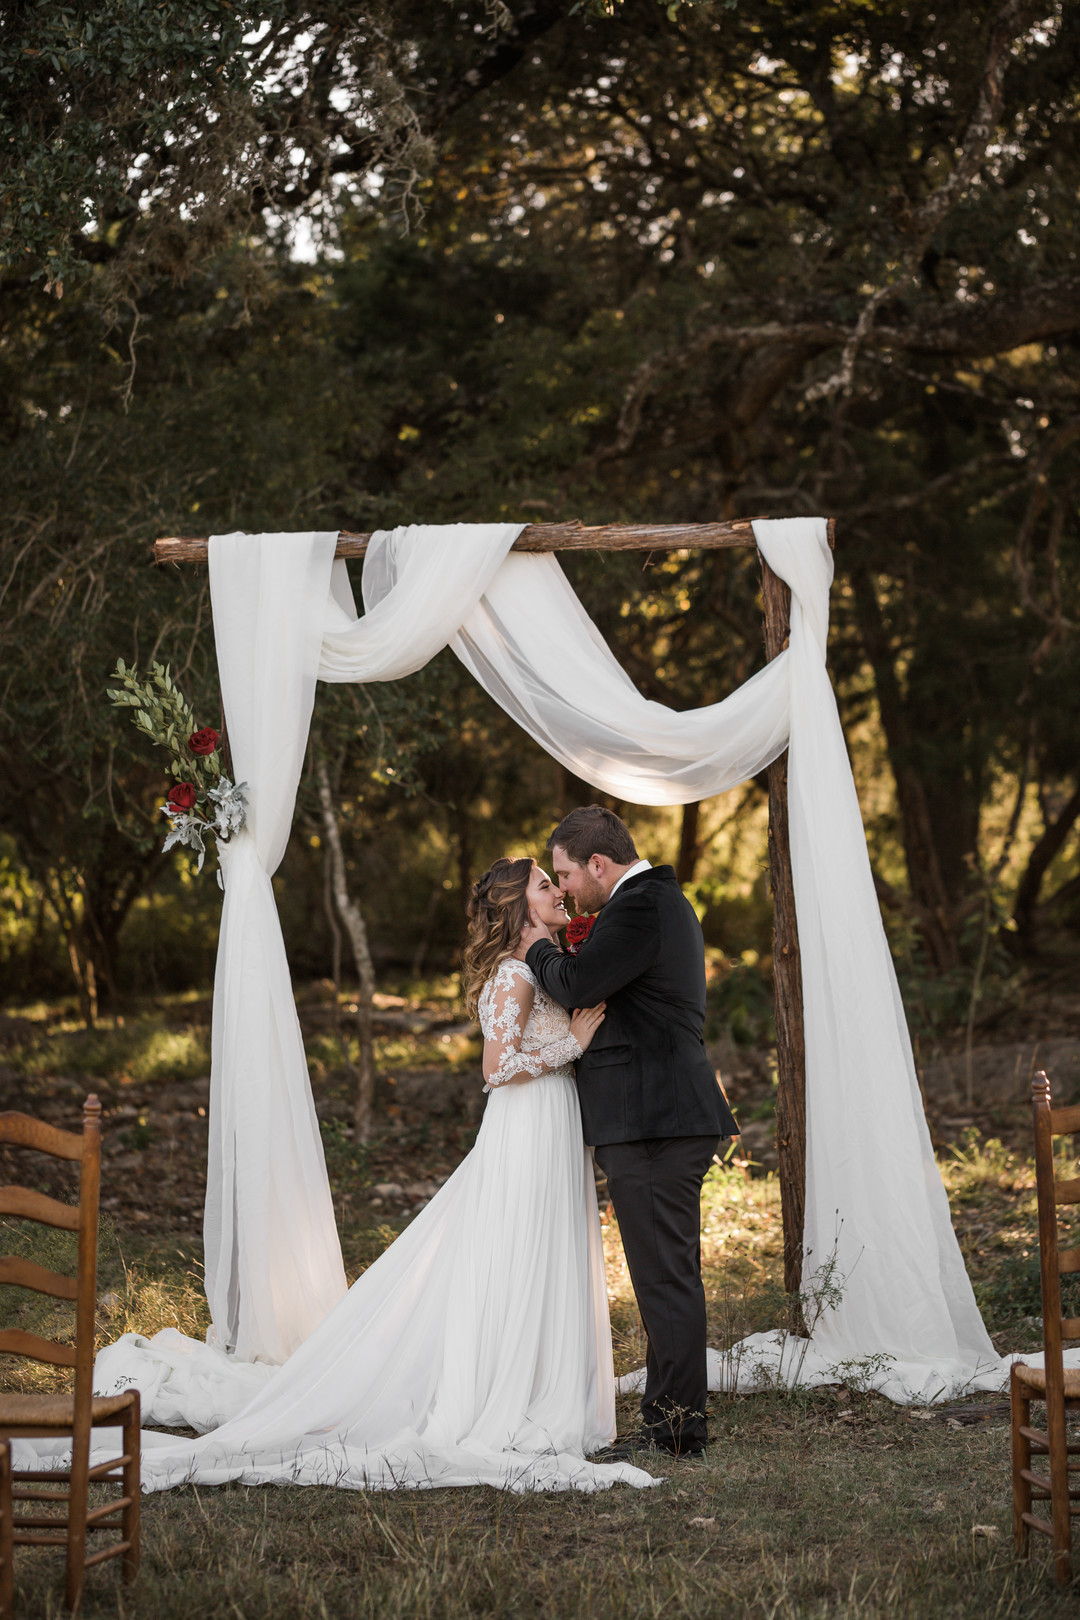 bröllop+klänning+rustikt+elopement